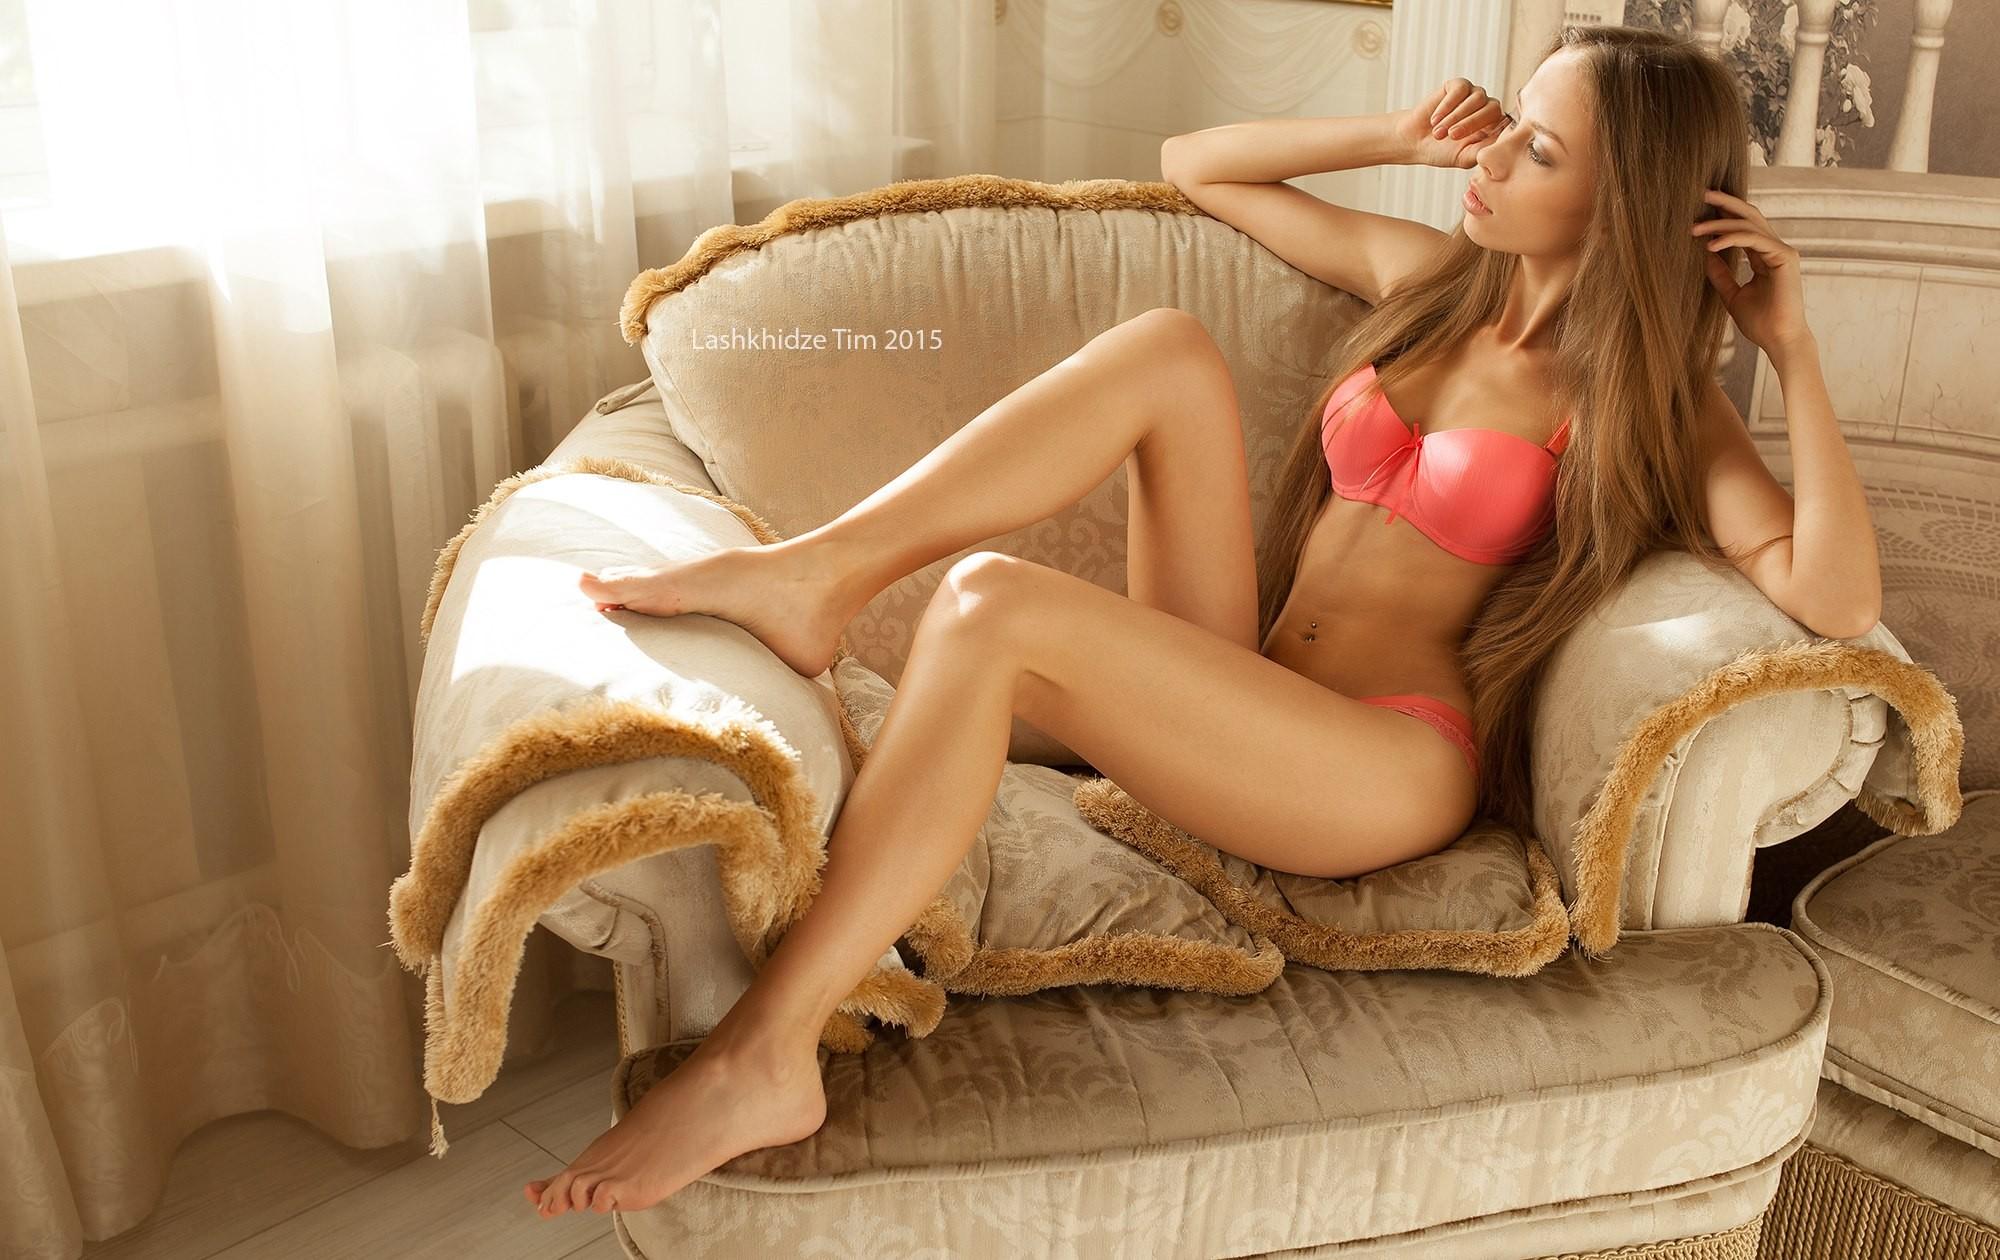 People 2000x1260 women sitting pierced navel blonde lingerie looking away Tim Lashkhidze